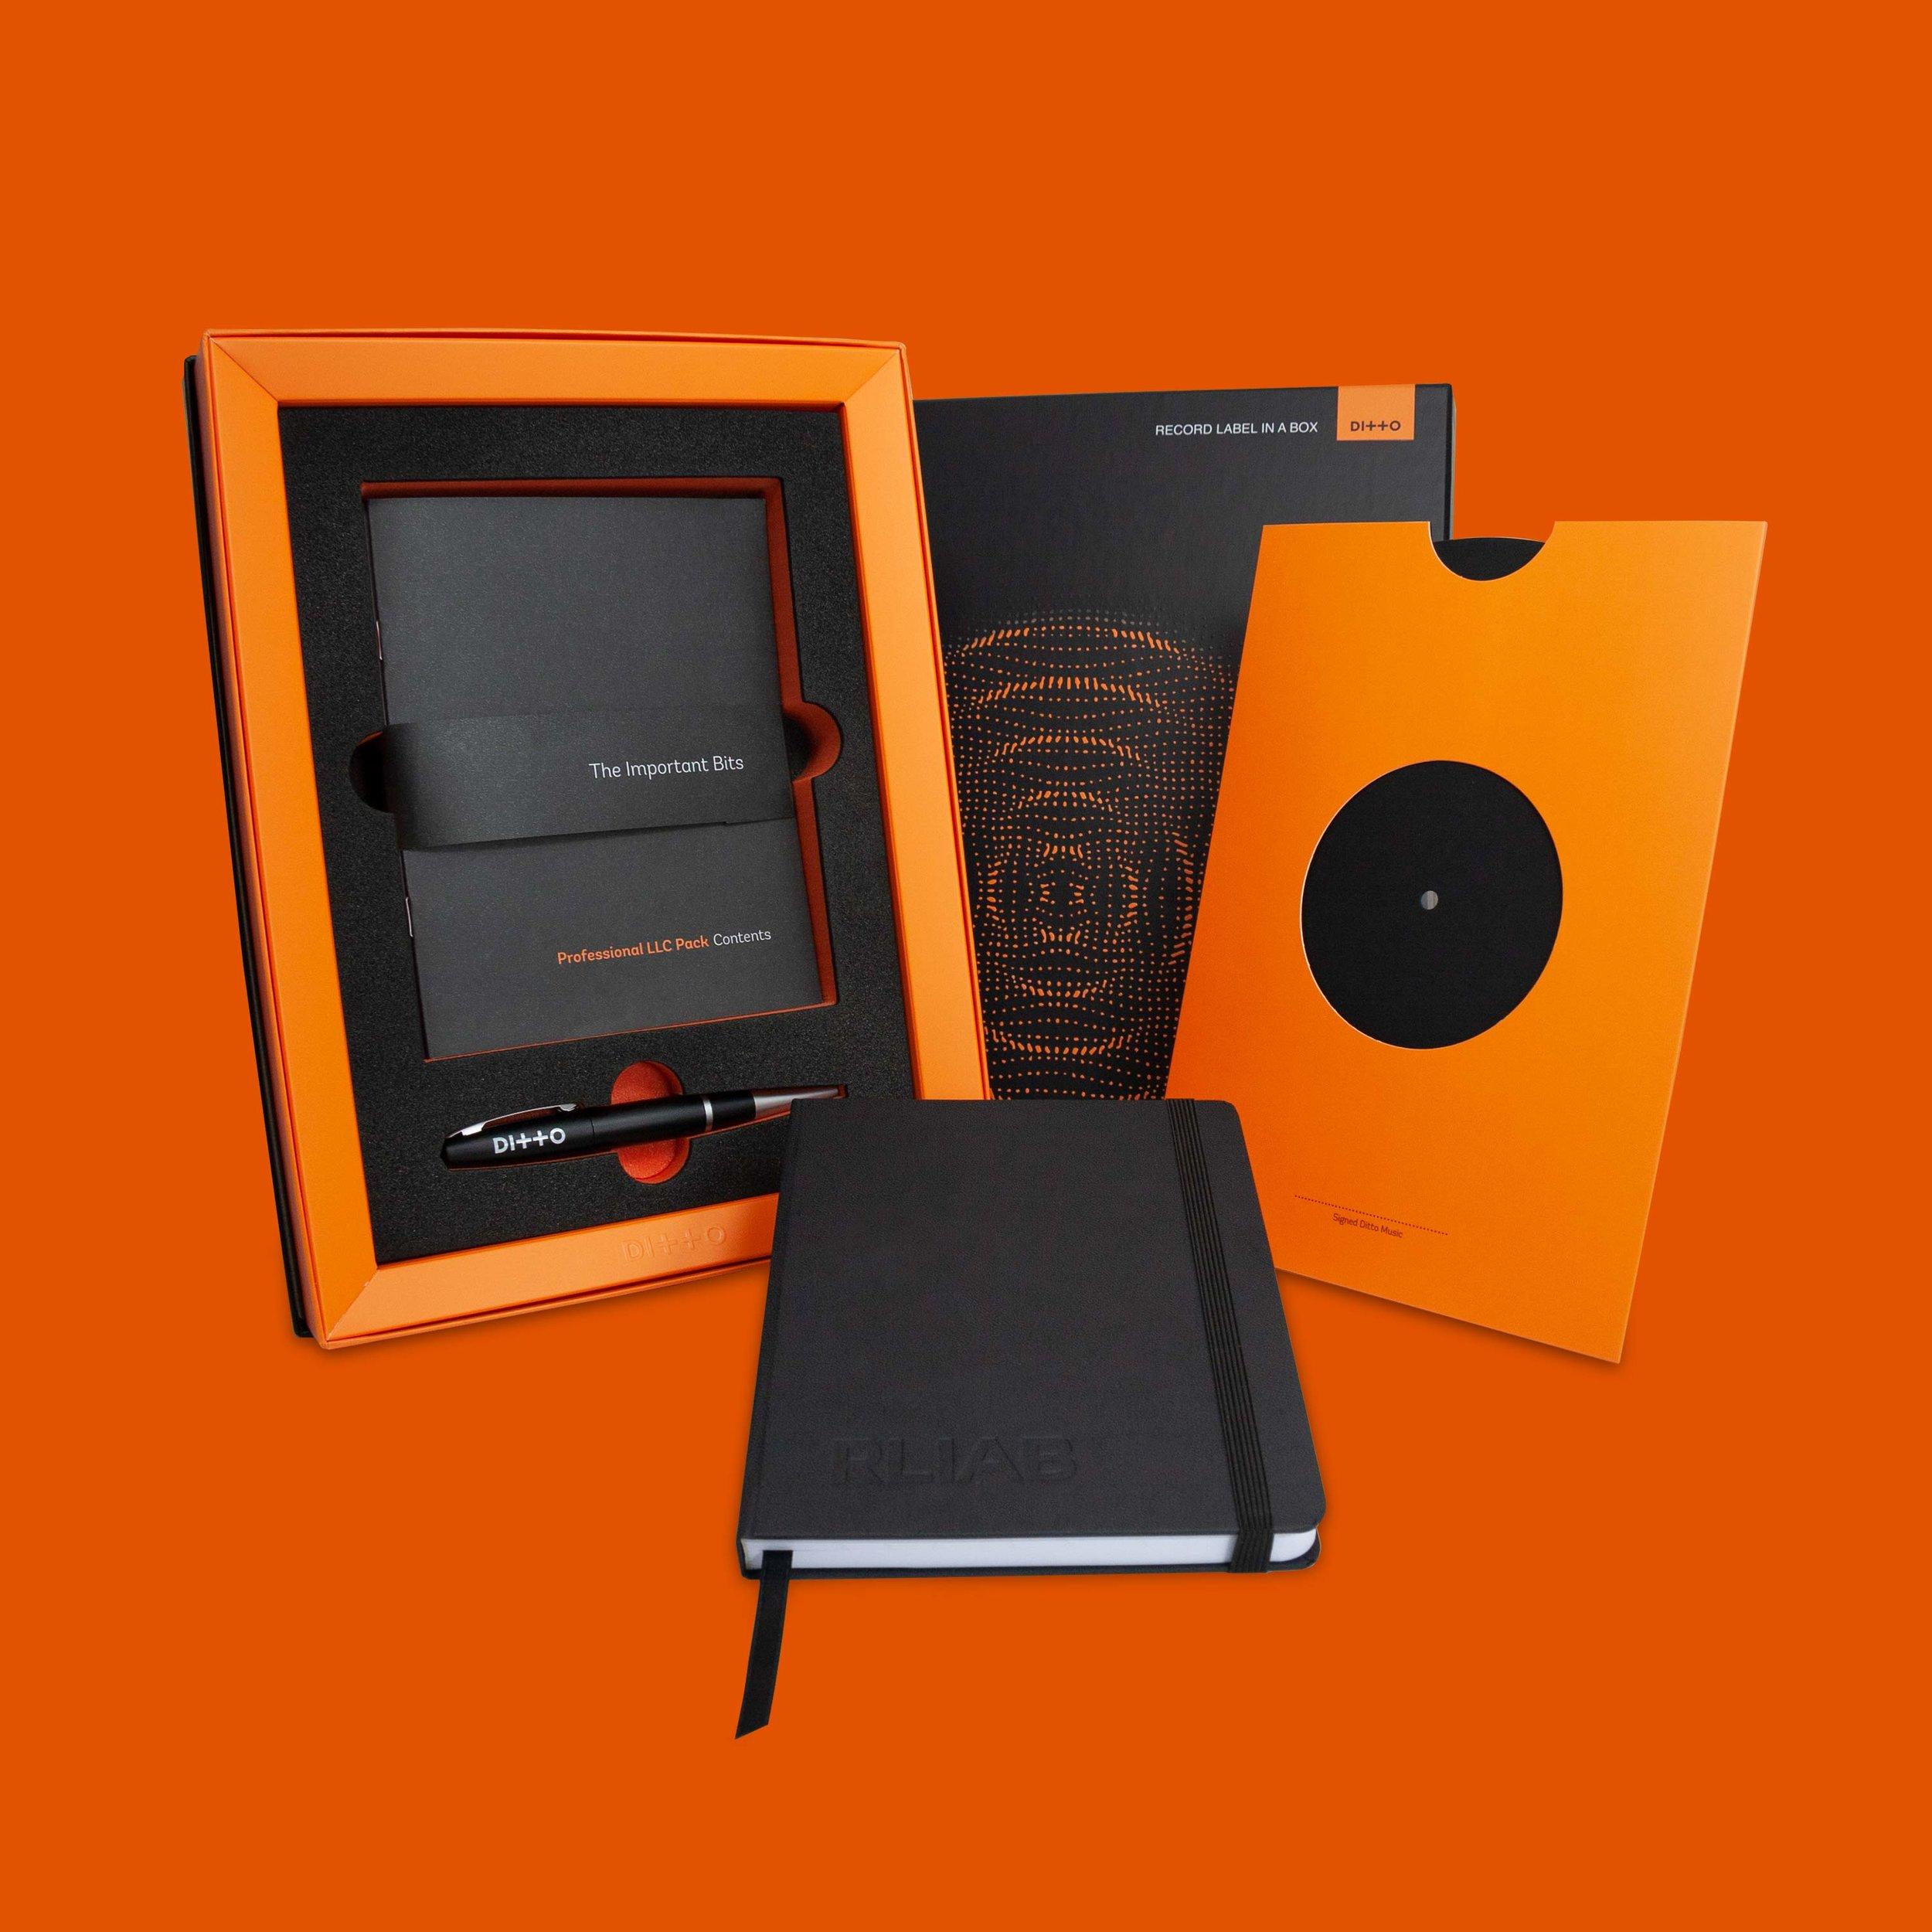 RLIAB-Rigid-Box-Foam-Prototype-Mail-Order-Box-Packaging-Prototype-Design.jpg